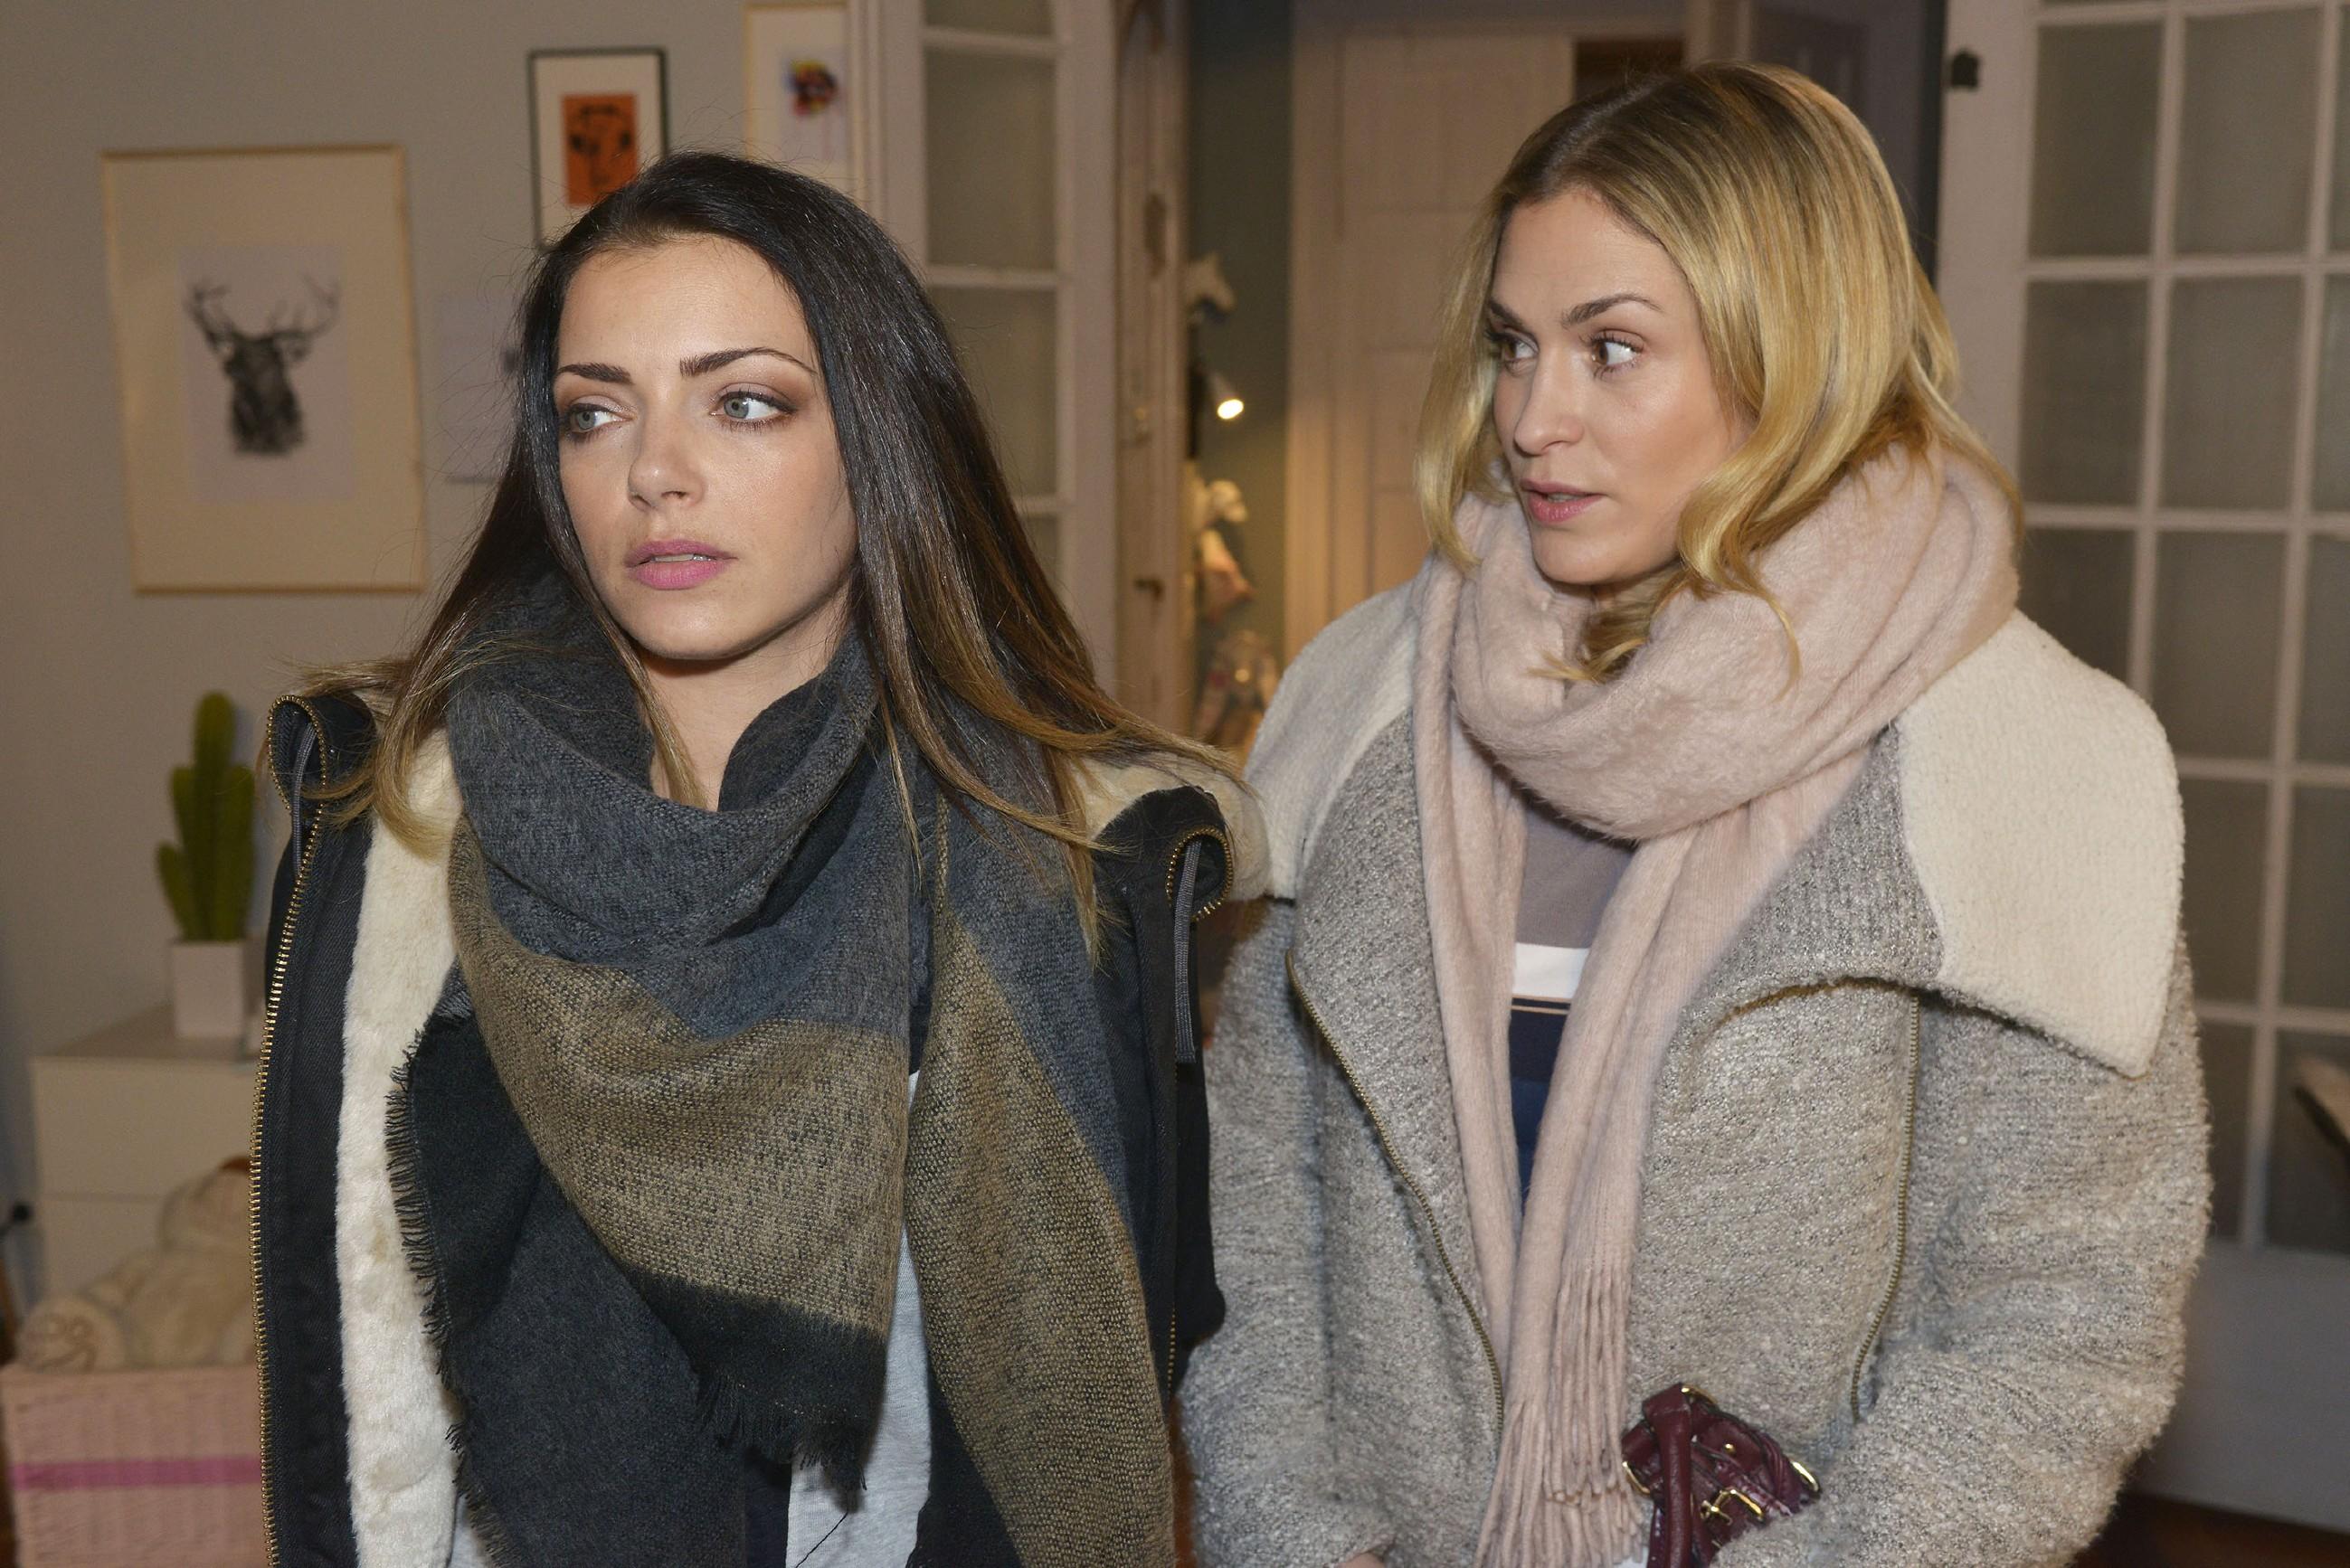 Sophie (Lea Marlen Woitack, r.) wundert sich über Emilys (Anne Menden) ablehnende Haltung Paul gegenüber. (Quelle: RTL / Rolf Baumgartner)